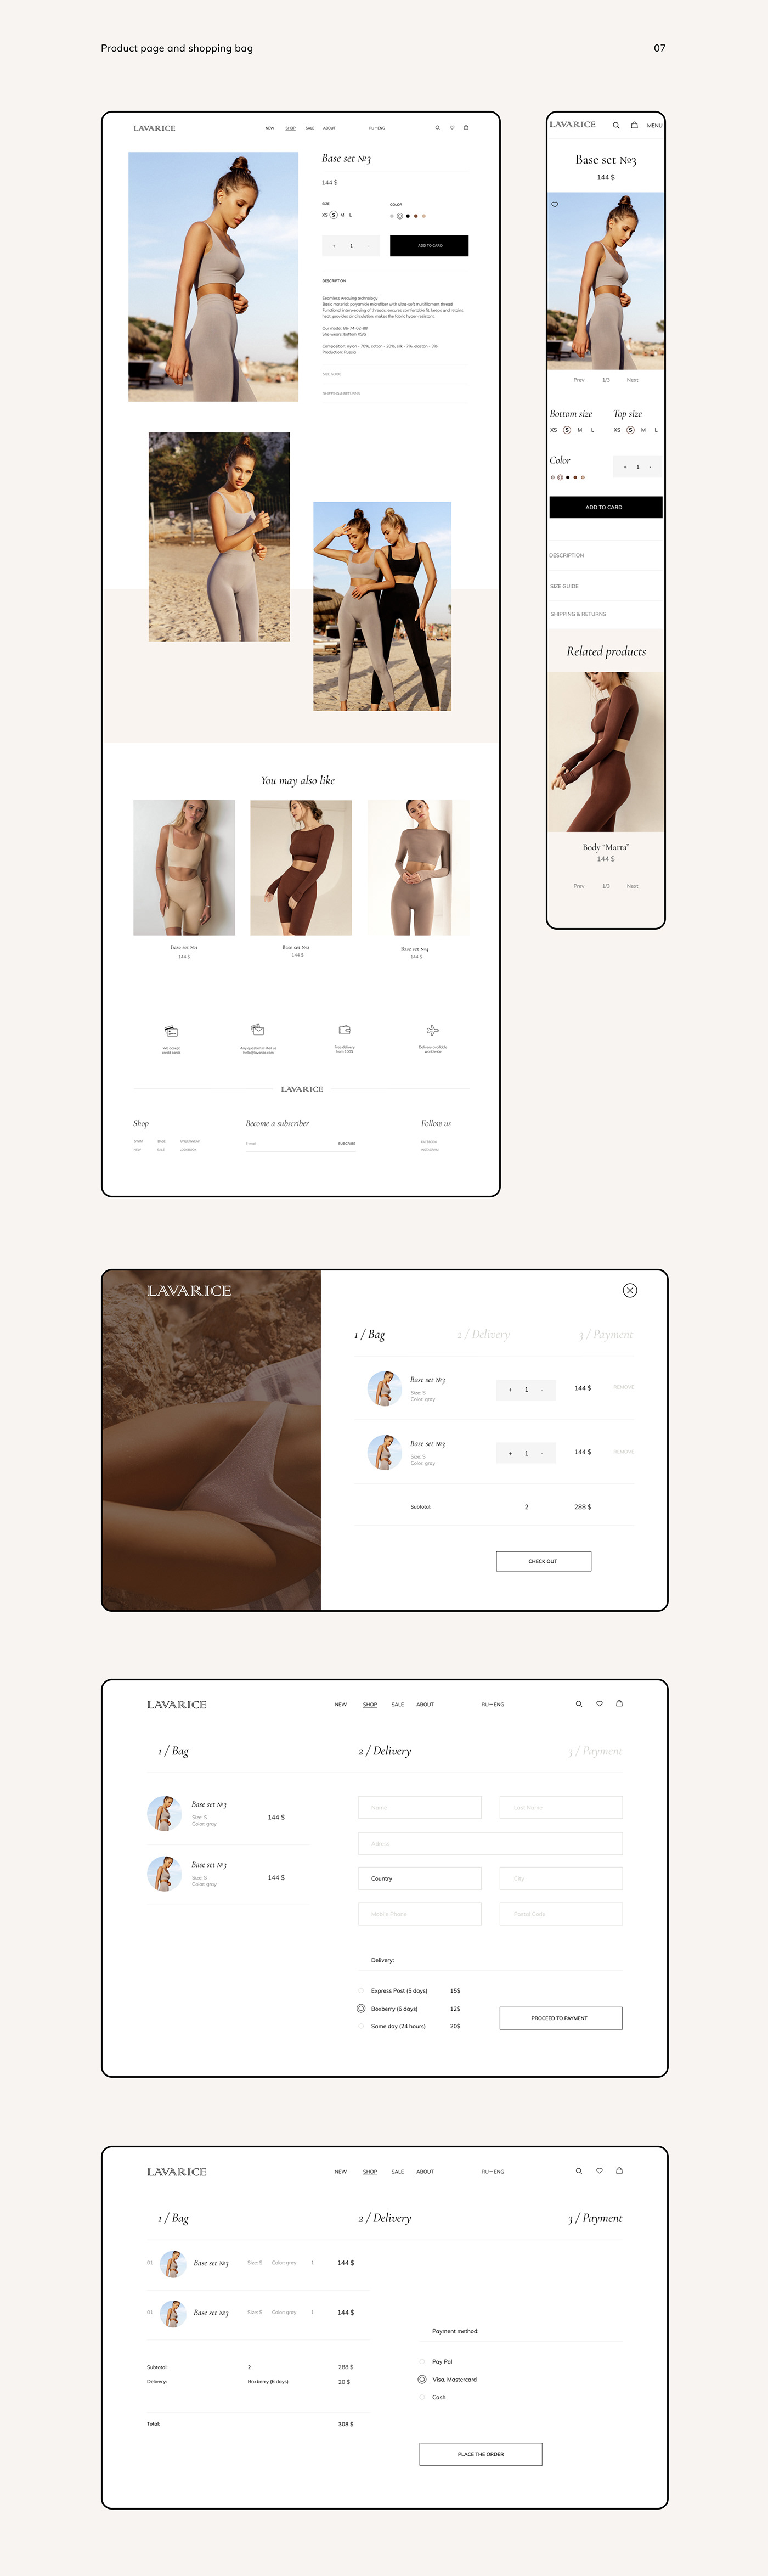 boutique brand E COMMERCE Fashion  fashionbrand onlinestore Sportswear swimwear Webdesign